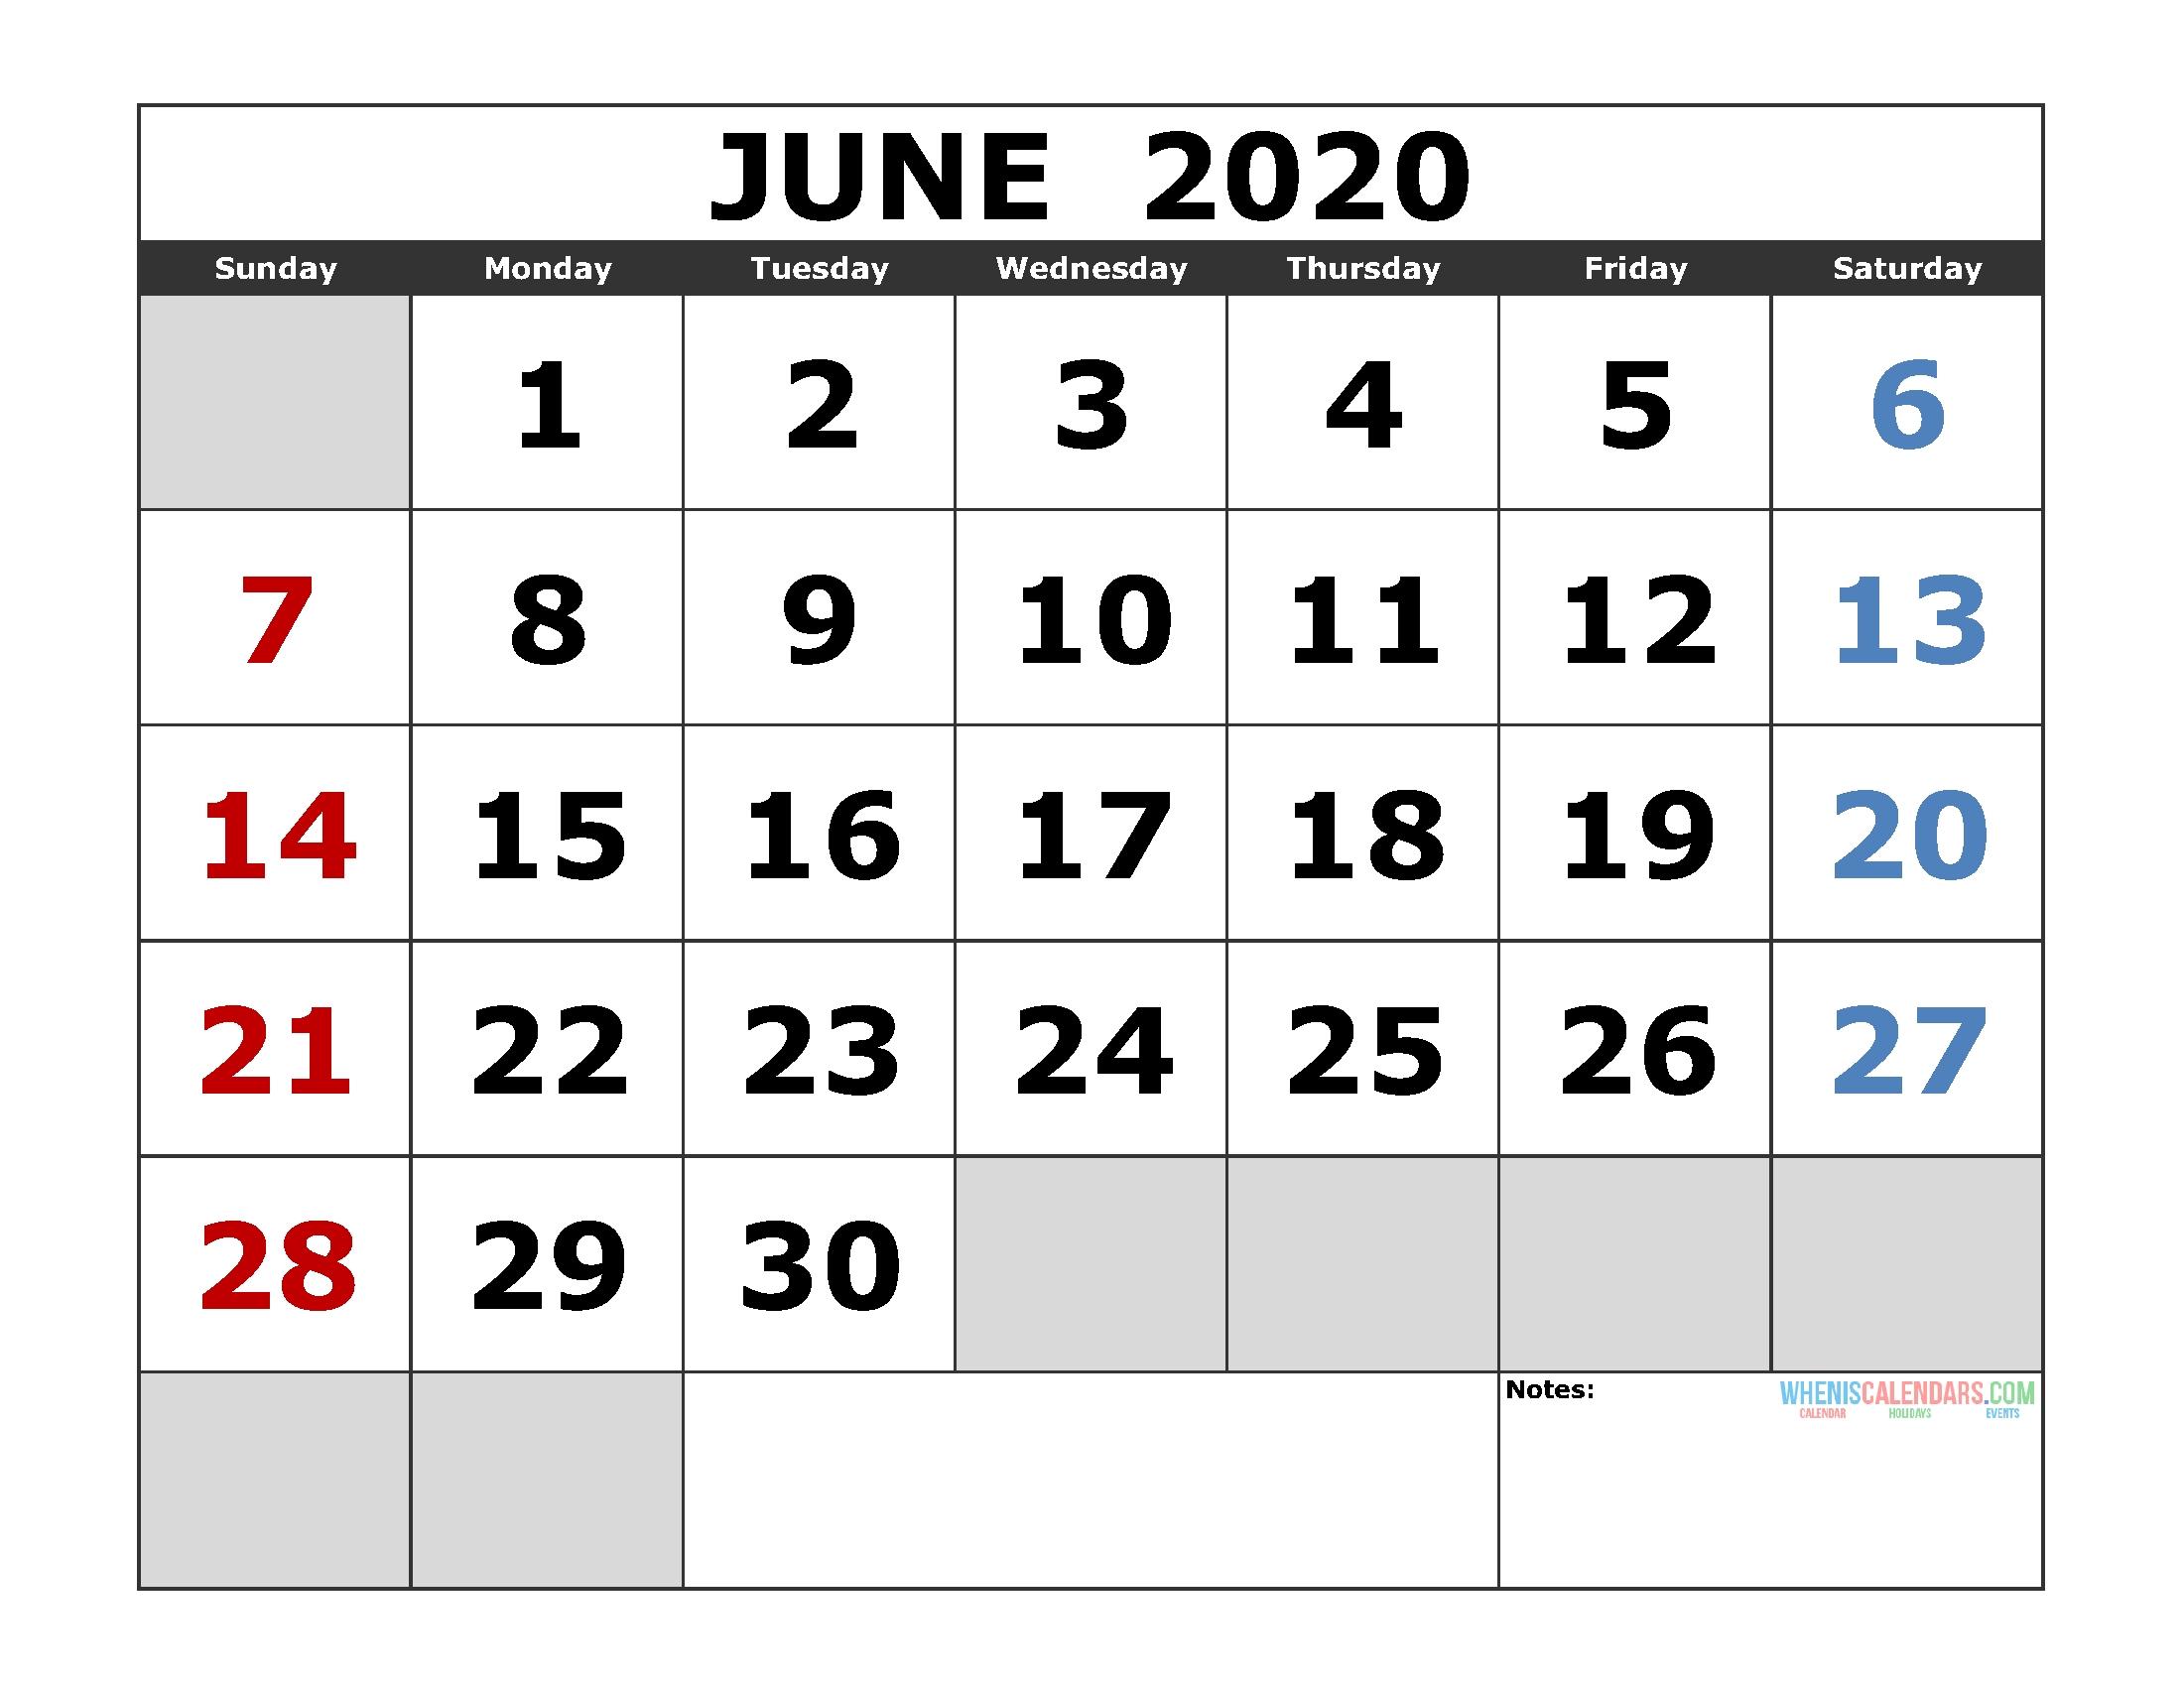 June 2020 Printable Calendar Template Excel, Pdf, Image [Us-April 2020 Jewish Holidays Calendar Print